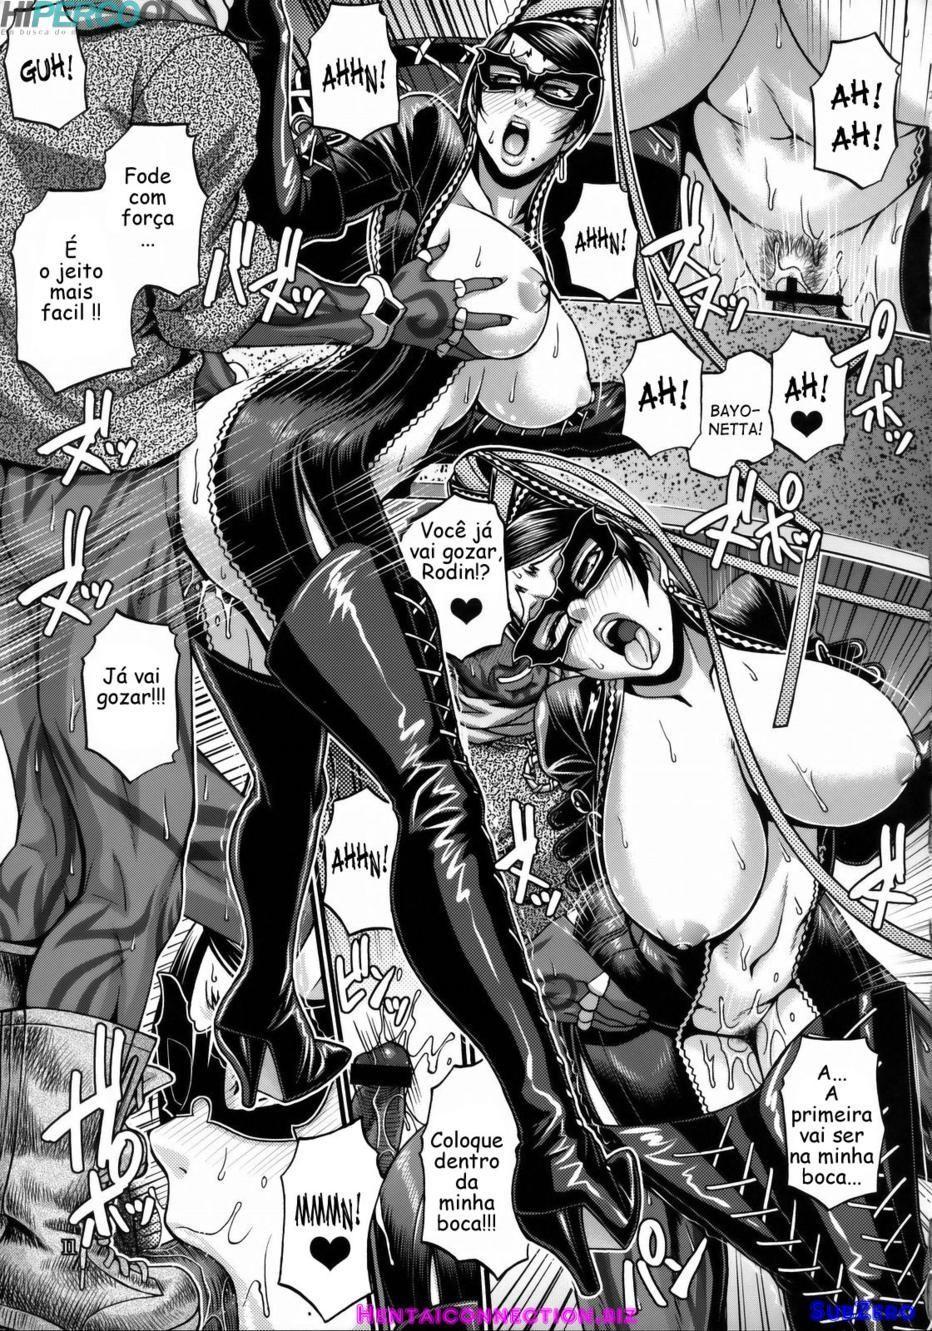 Bayonetta-hentai-Home-10